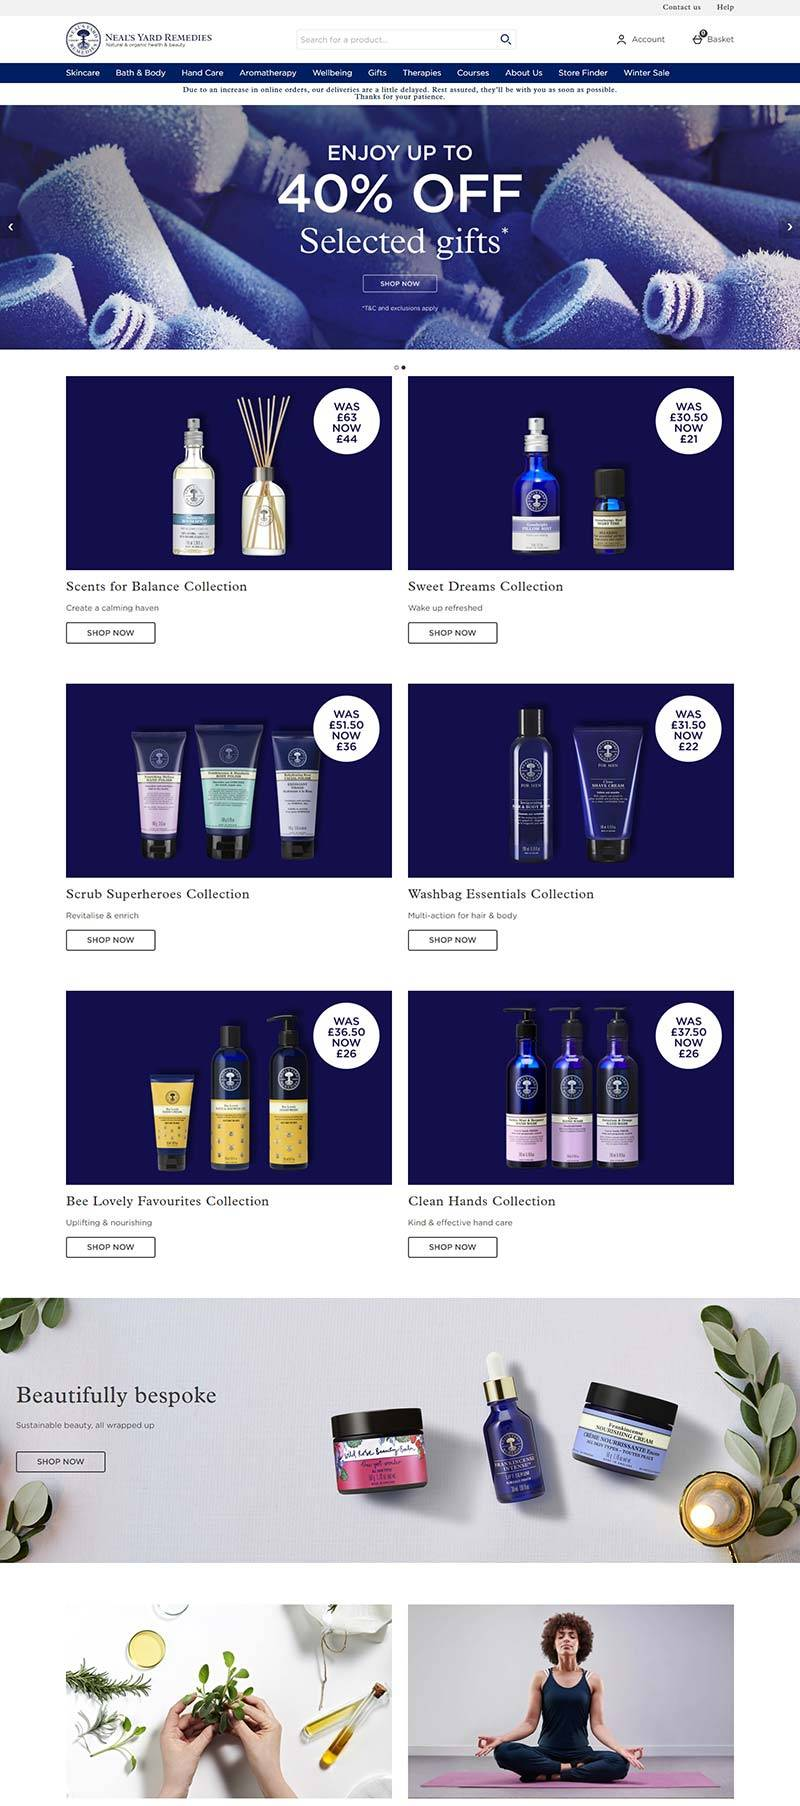 NYR-Neals Yard Remedies 英国健康美容品牌网站